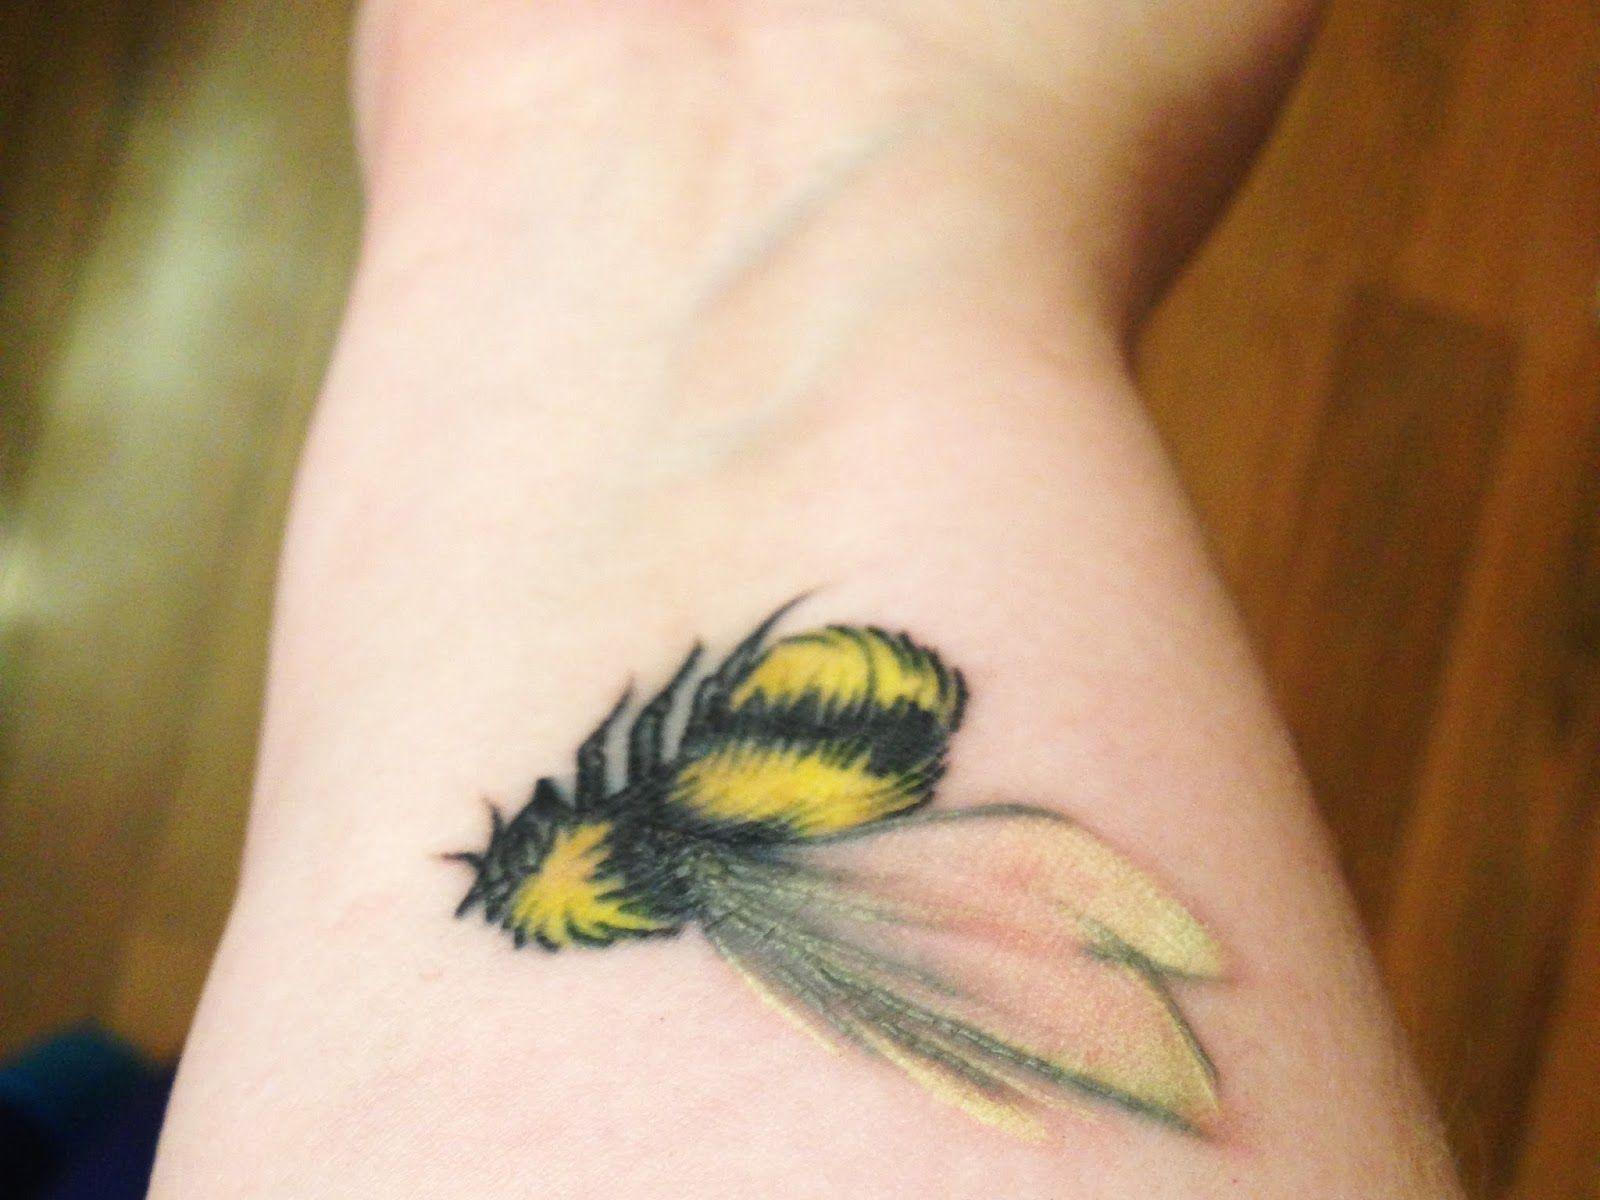 Misfit Isle: The Buzz on My First Tattoo